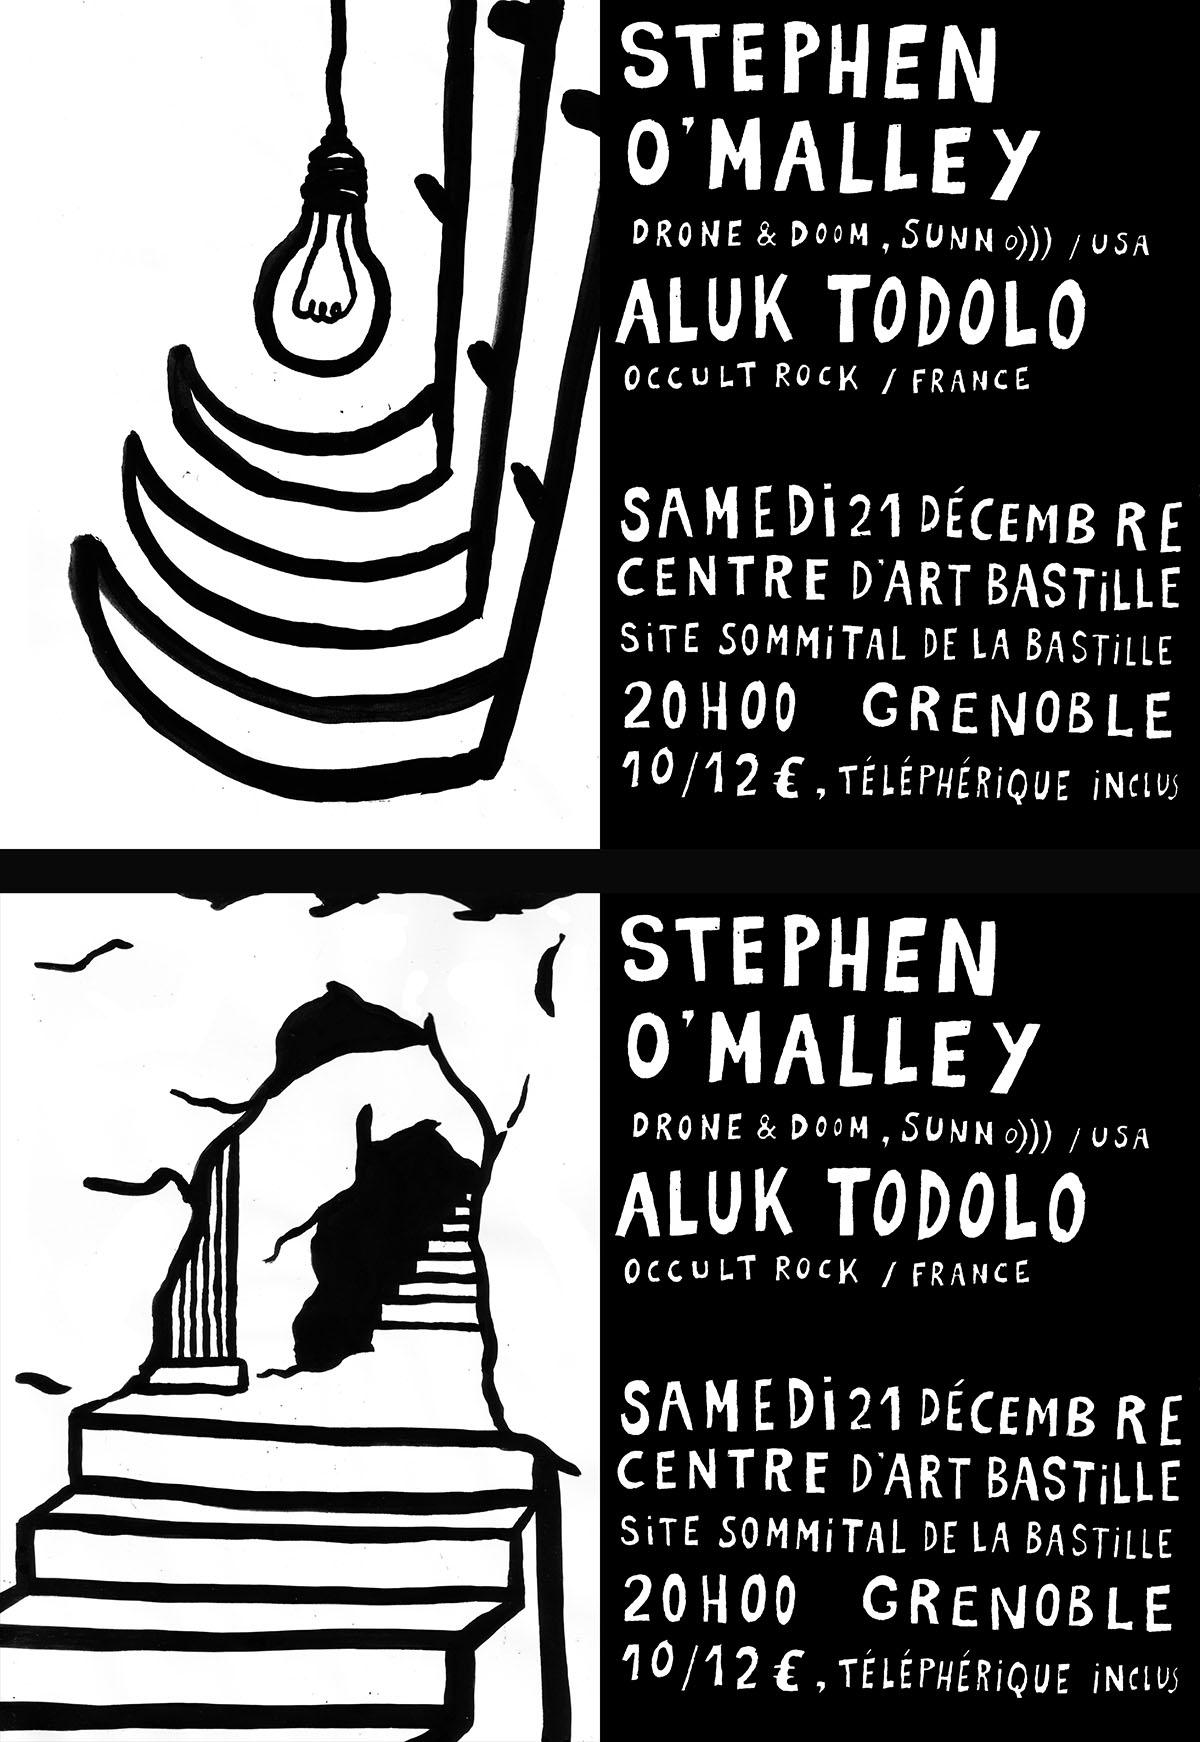 Stephen O'Malley (solo) @ Centre d'Art Bastille